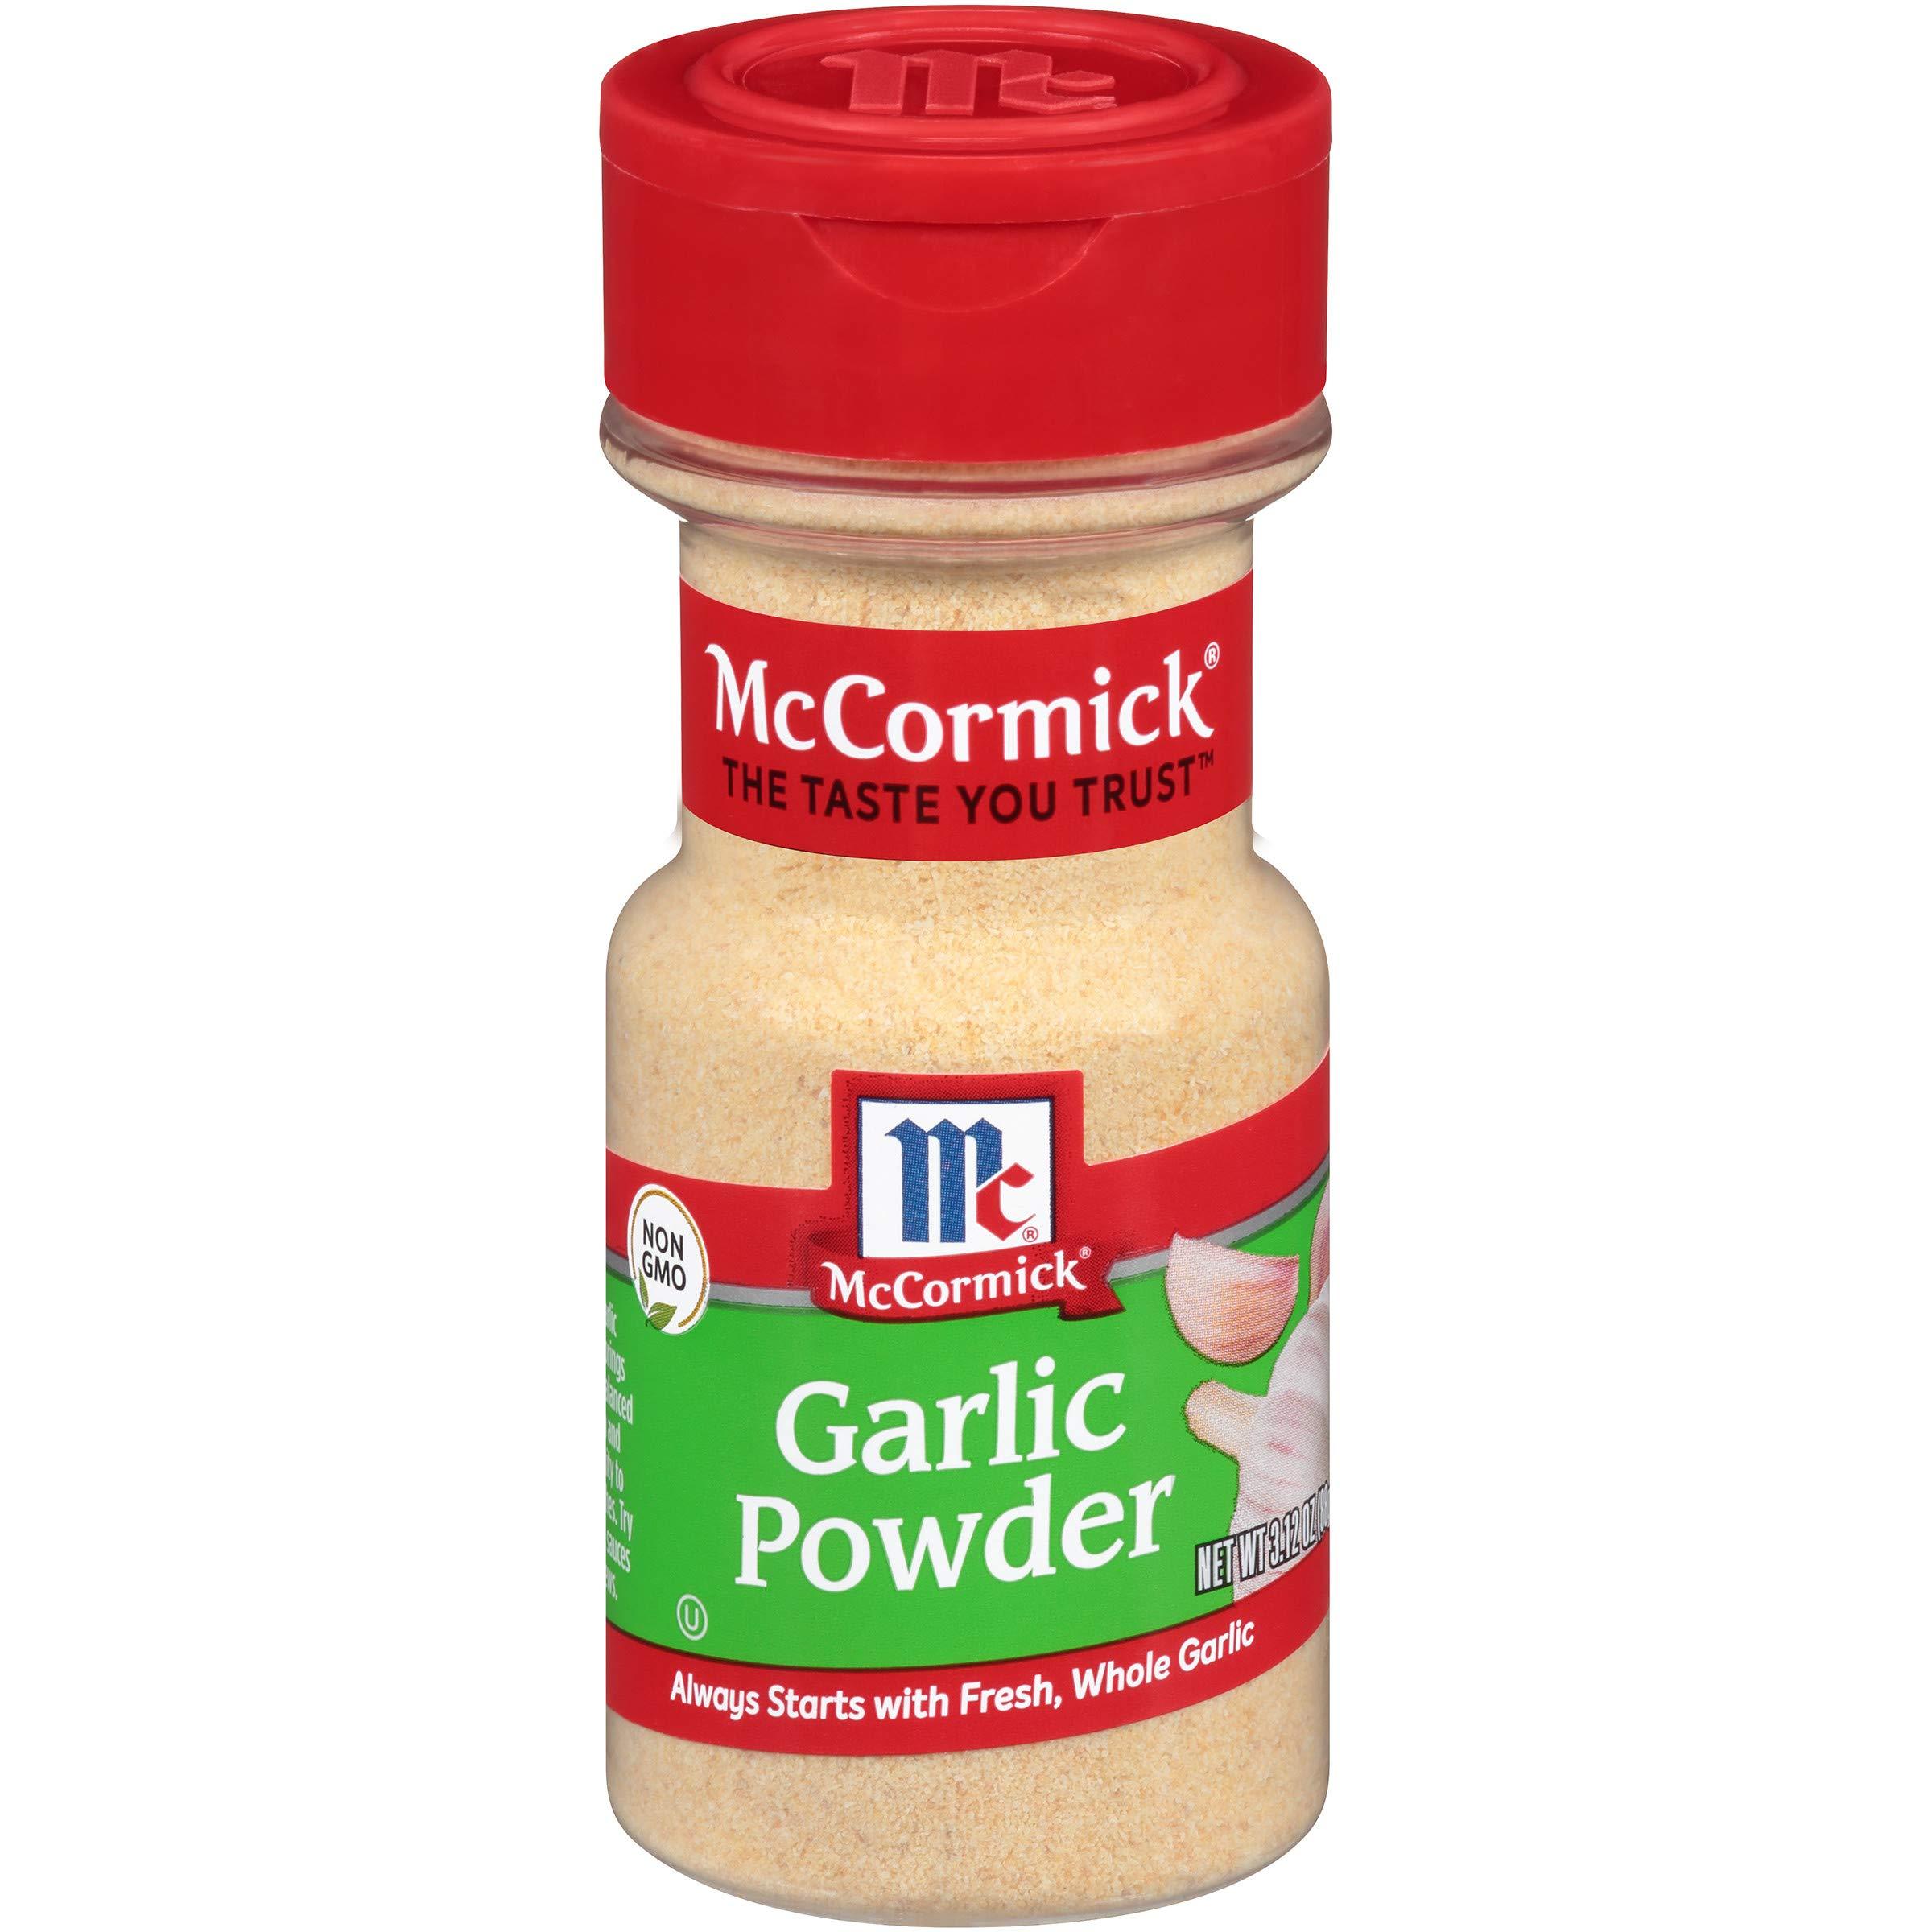 McCormick Classic Garlic Powder, 3.12 oz